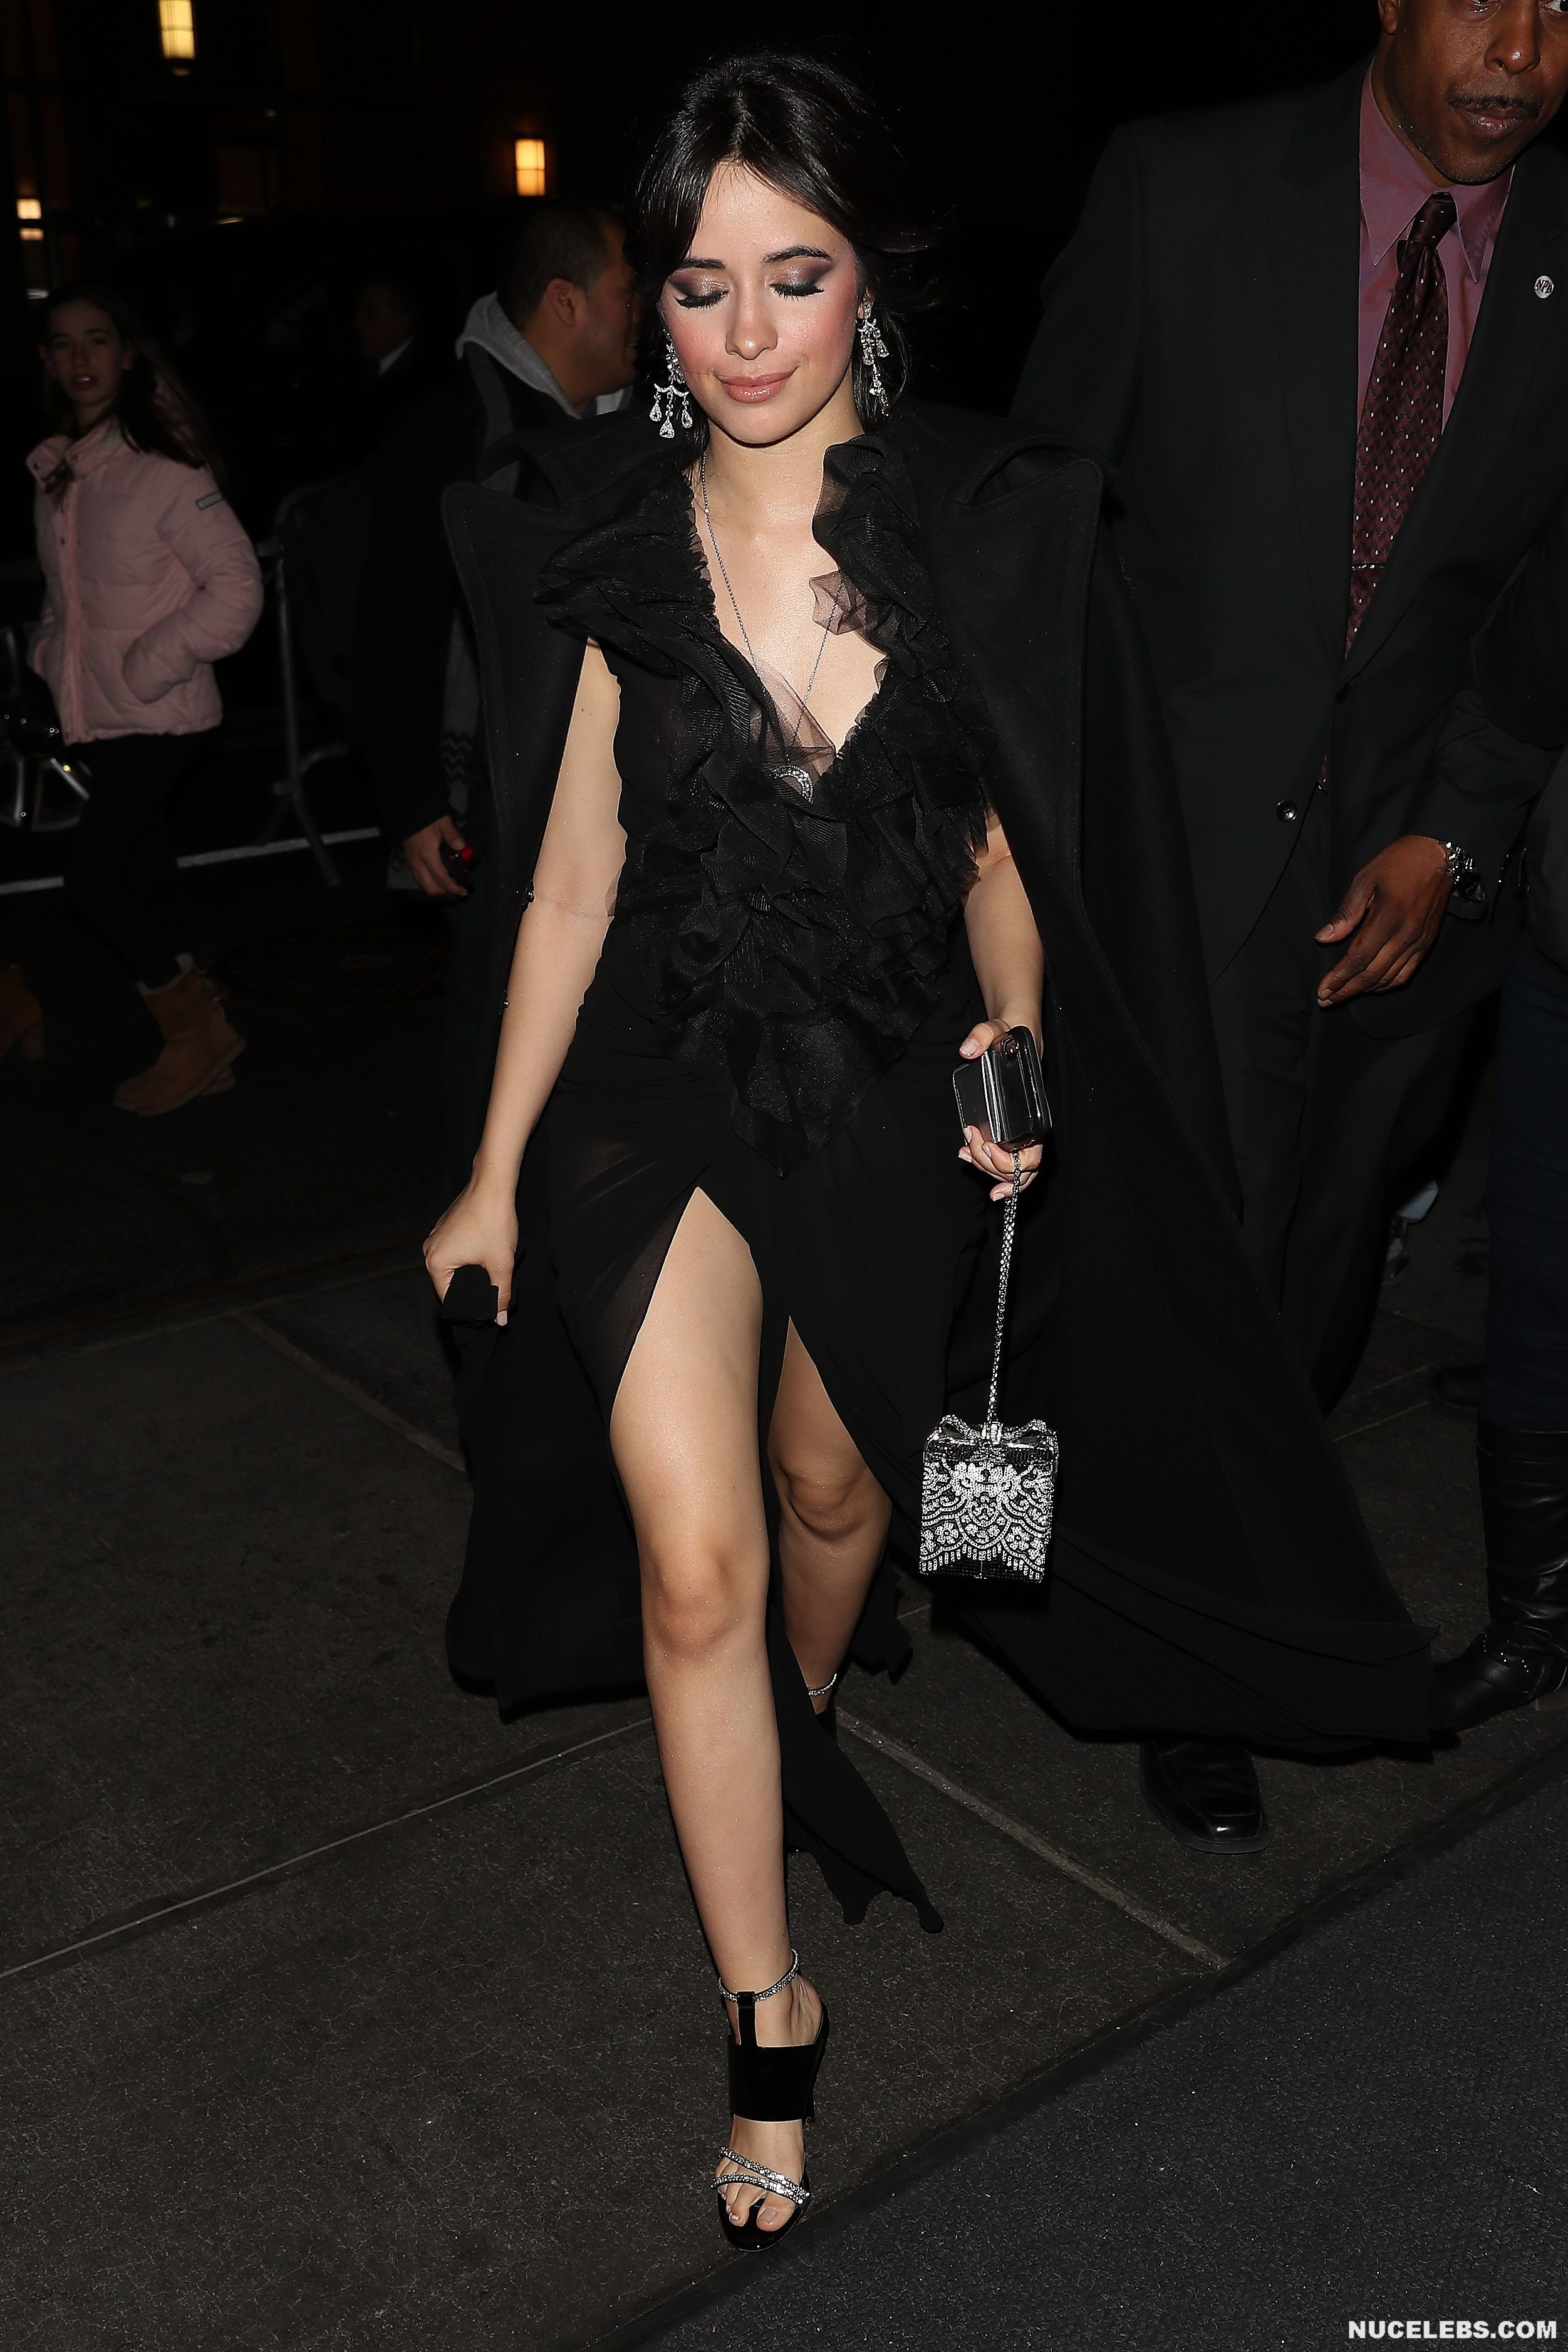 Camila Cabello Ass Slip And Sexy Photos - NuCelebs.com